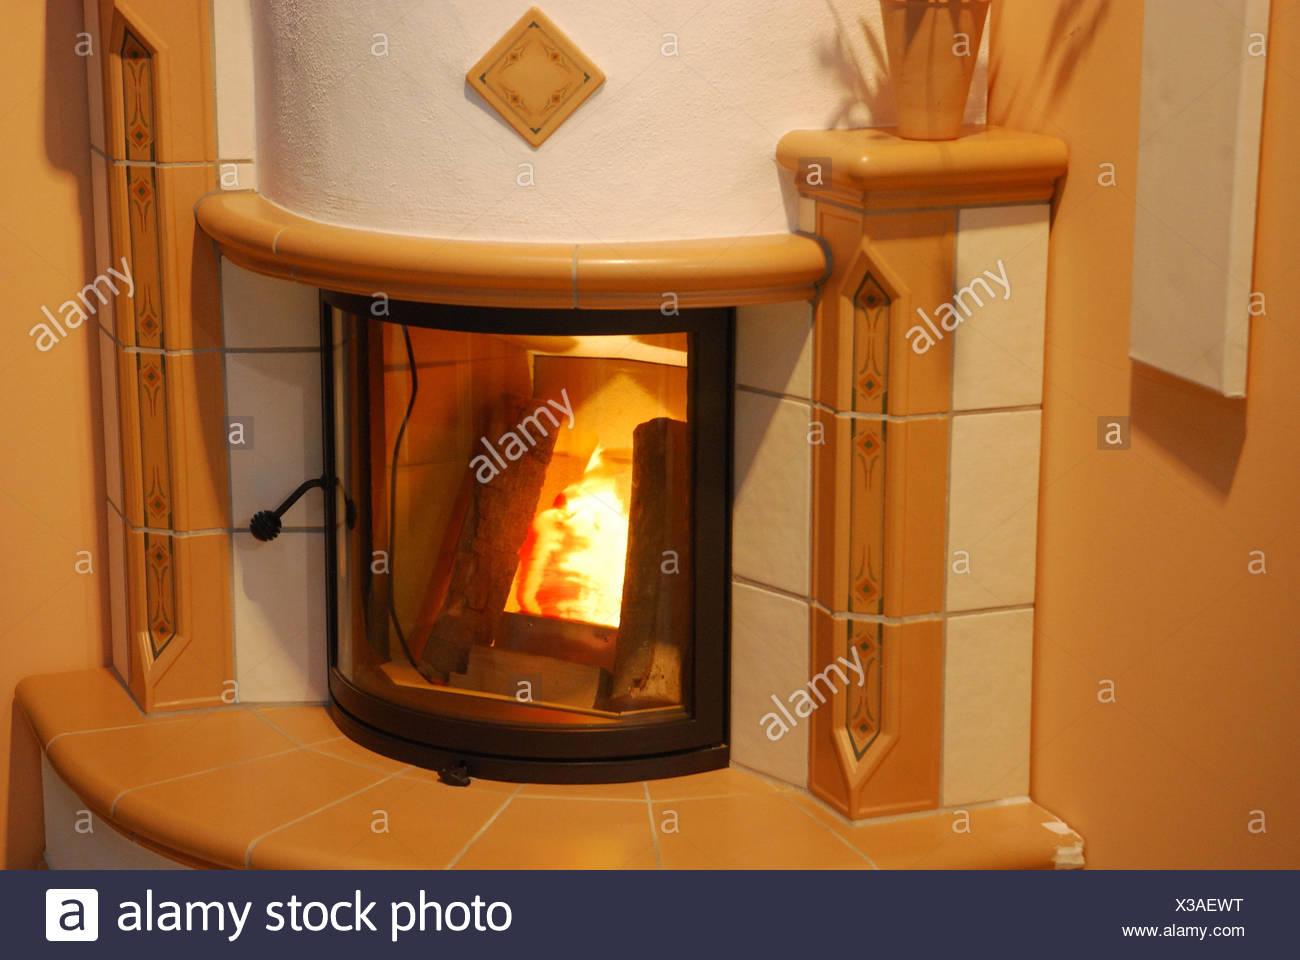 Kamin Ofen Offenes Feuer Flammen Stockfoto Bild 277441076 Alamy